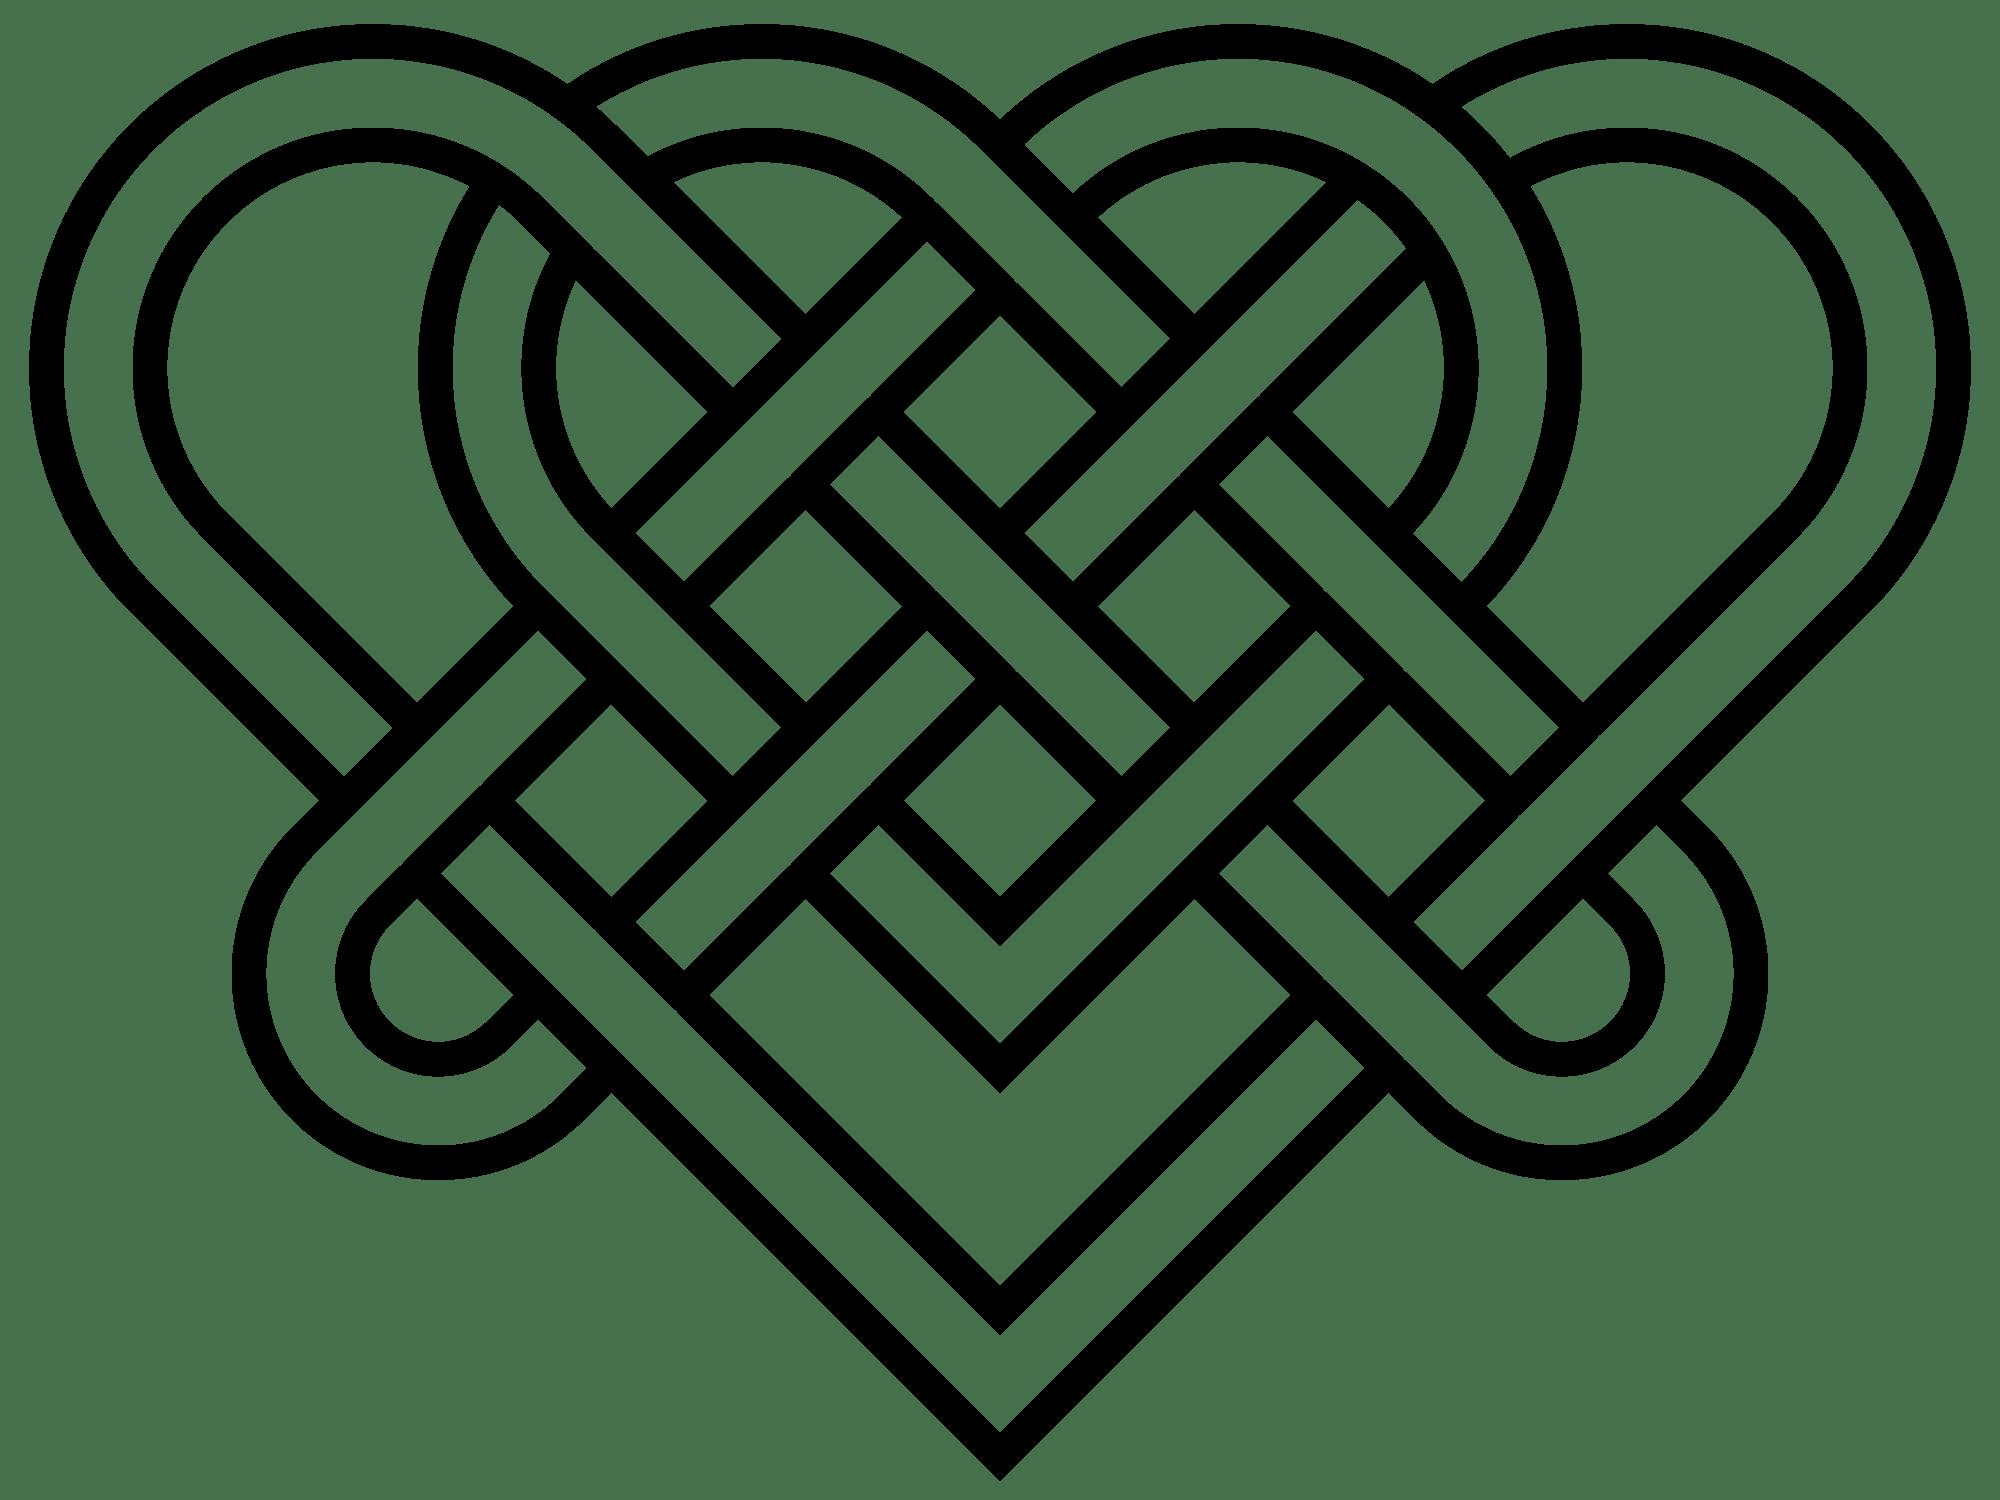 celtic knots transparent png images stickpng